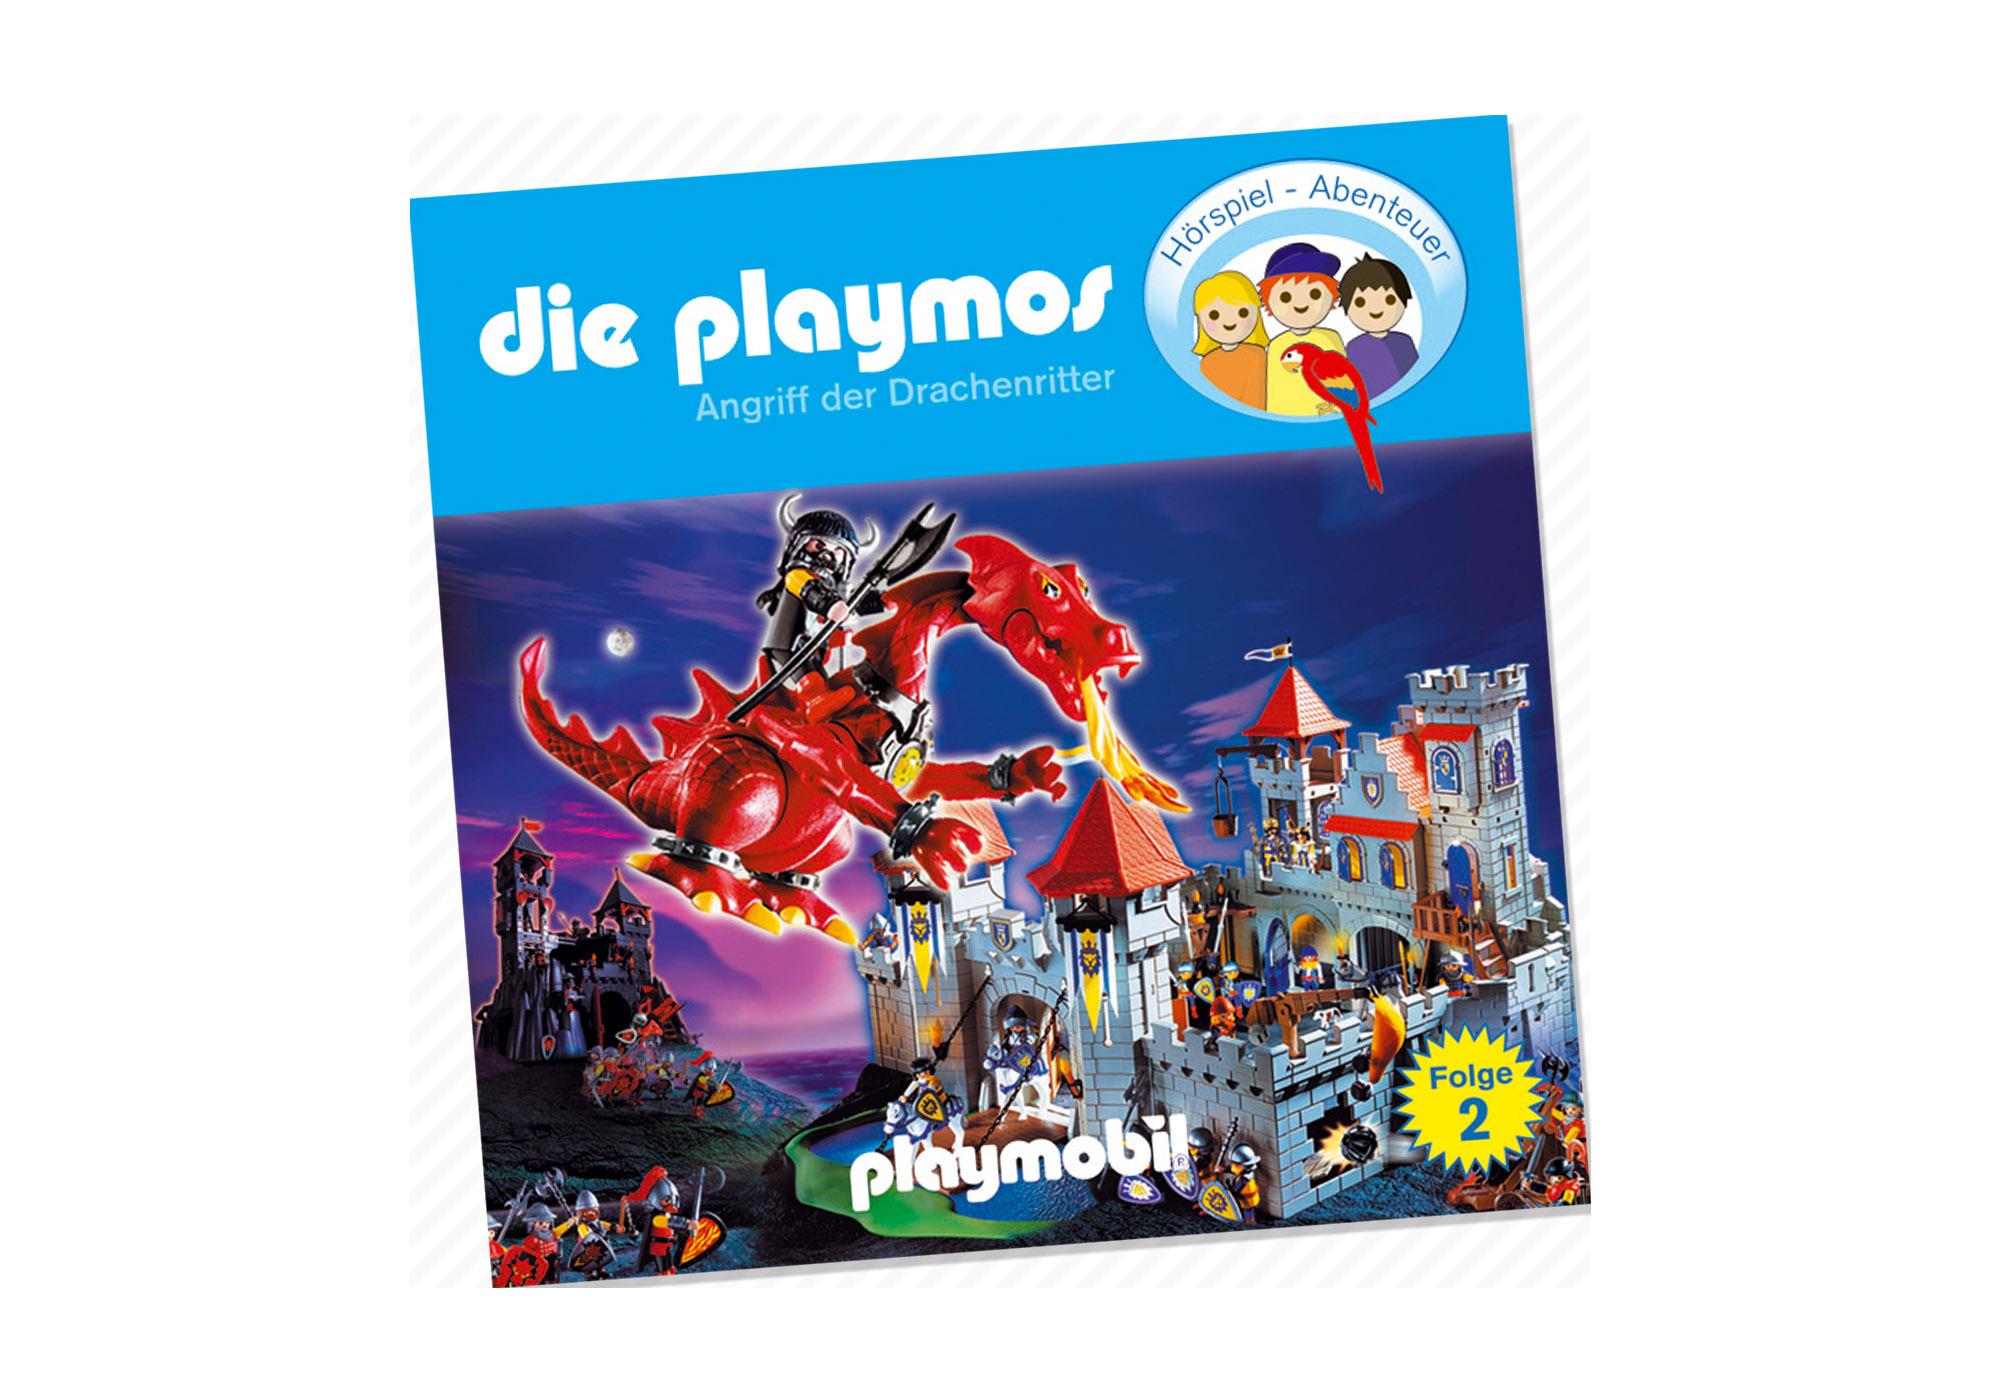 http://media.playmobil.com/i/playmobil/80130_product_detail